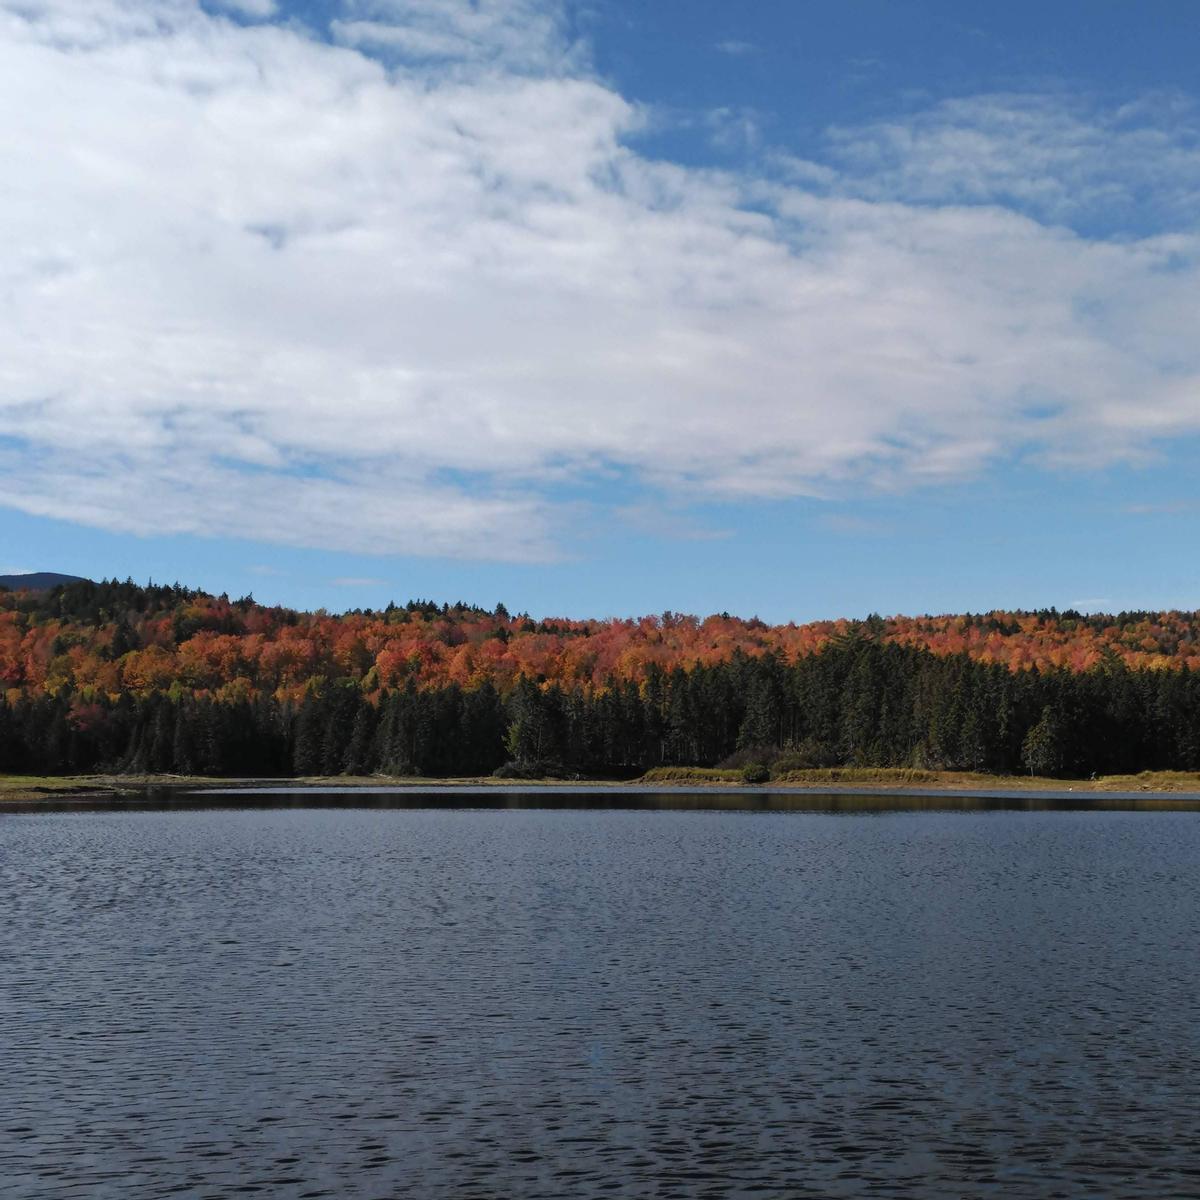 Breeze makes a slight riffle on a relatively calm lake